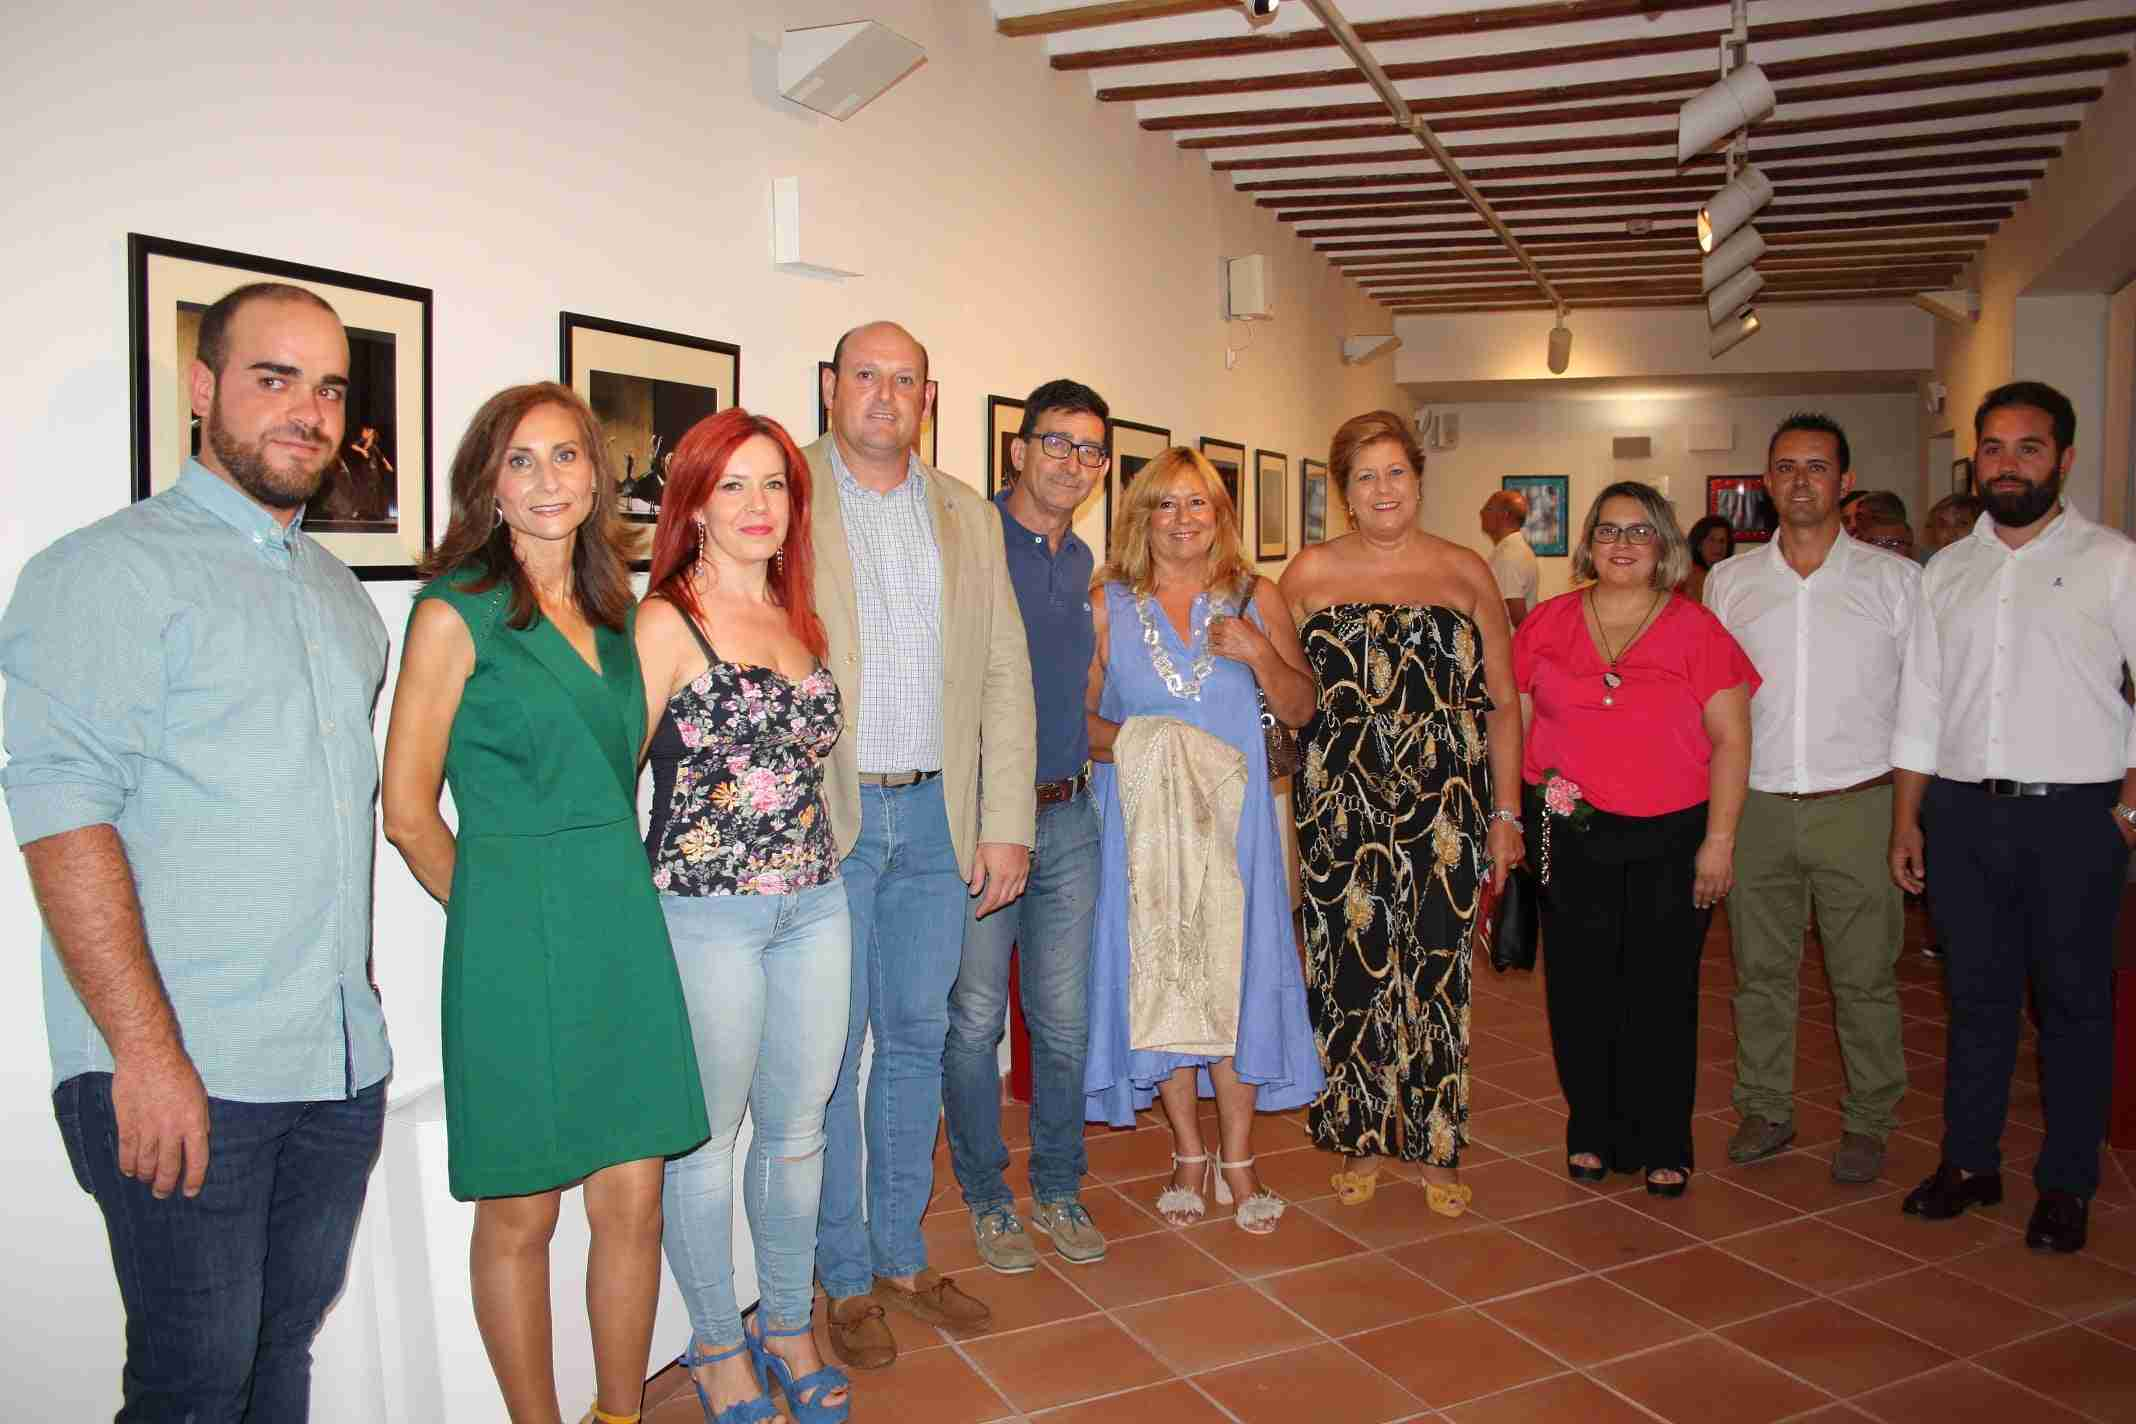 Merecido homenaje a Manuel Canseco, en el 9º Festival de Teatro y Títeres de Torralba de Calatrava 12